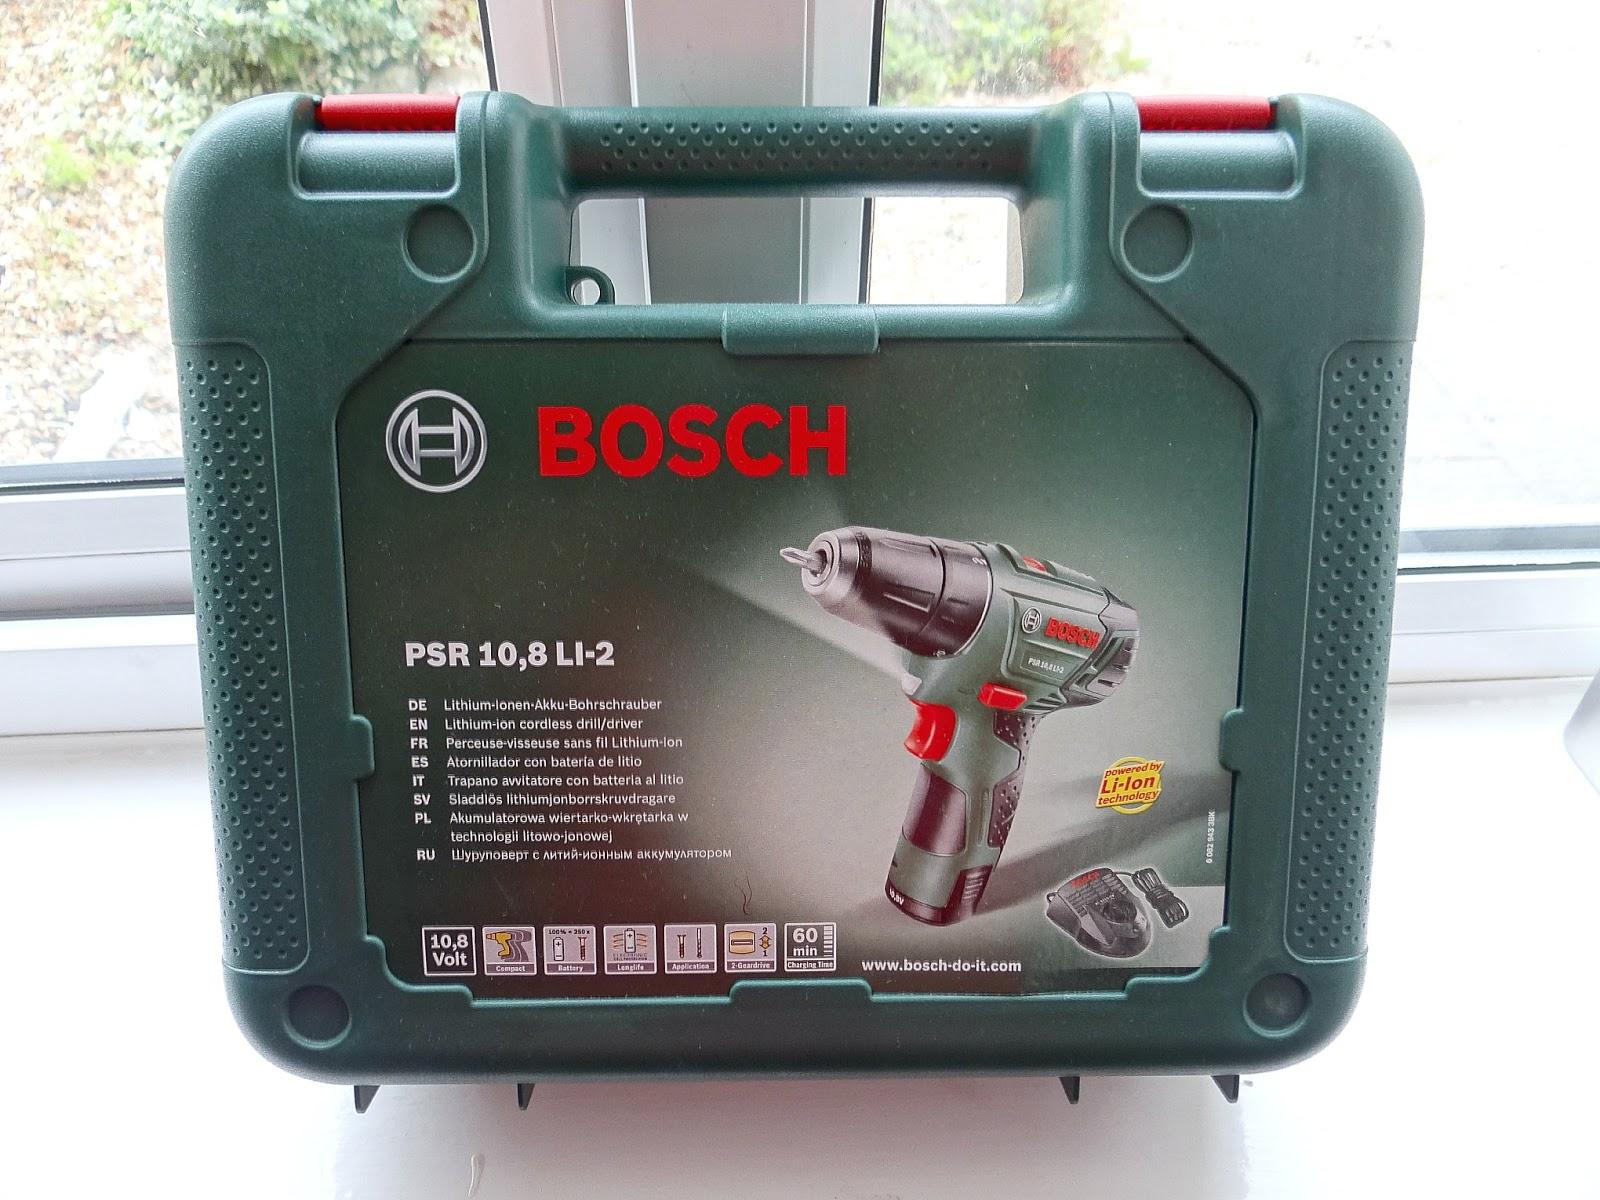 bosch ixo bbq and psr 10 8 li 2 cordless 2 speed drill. Black Bedroom Furniture Sets. Home Design Ideas